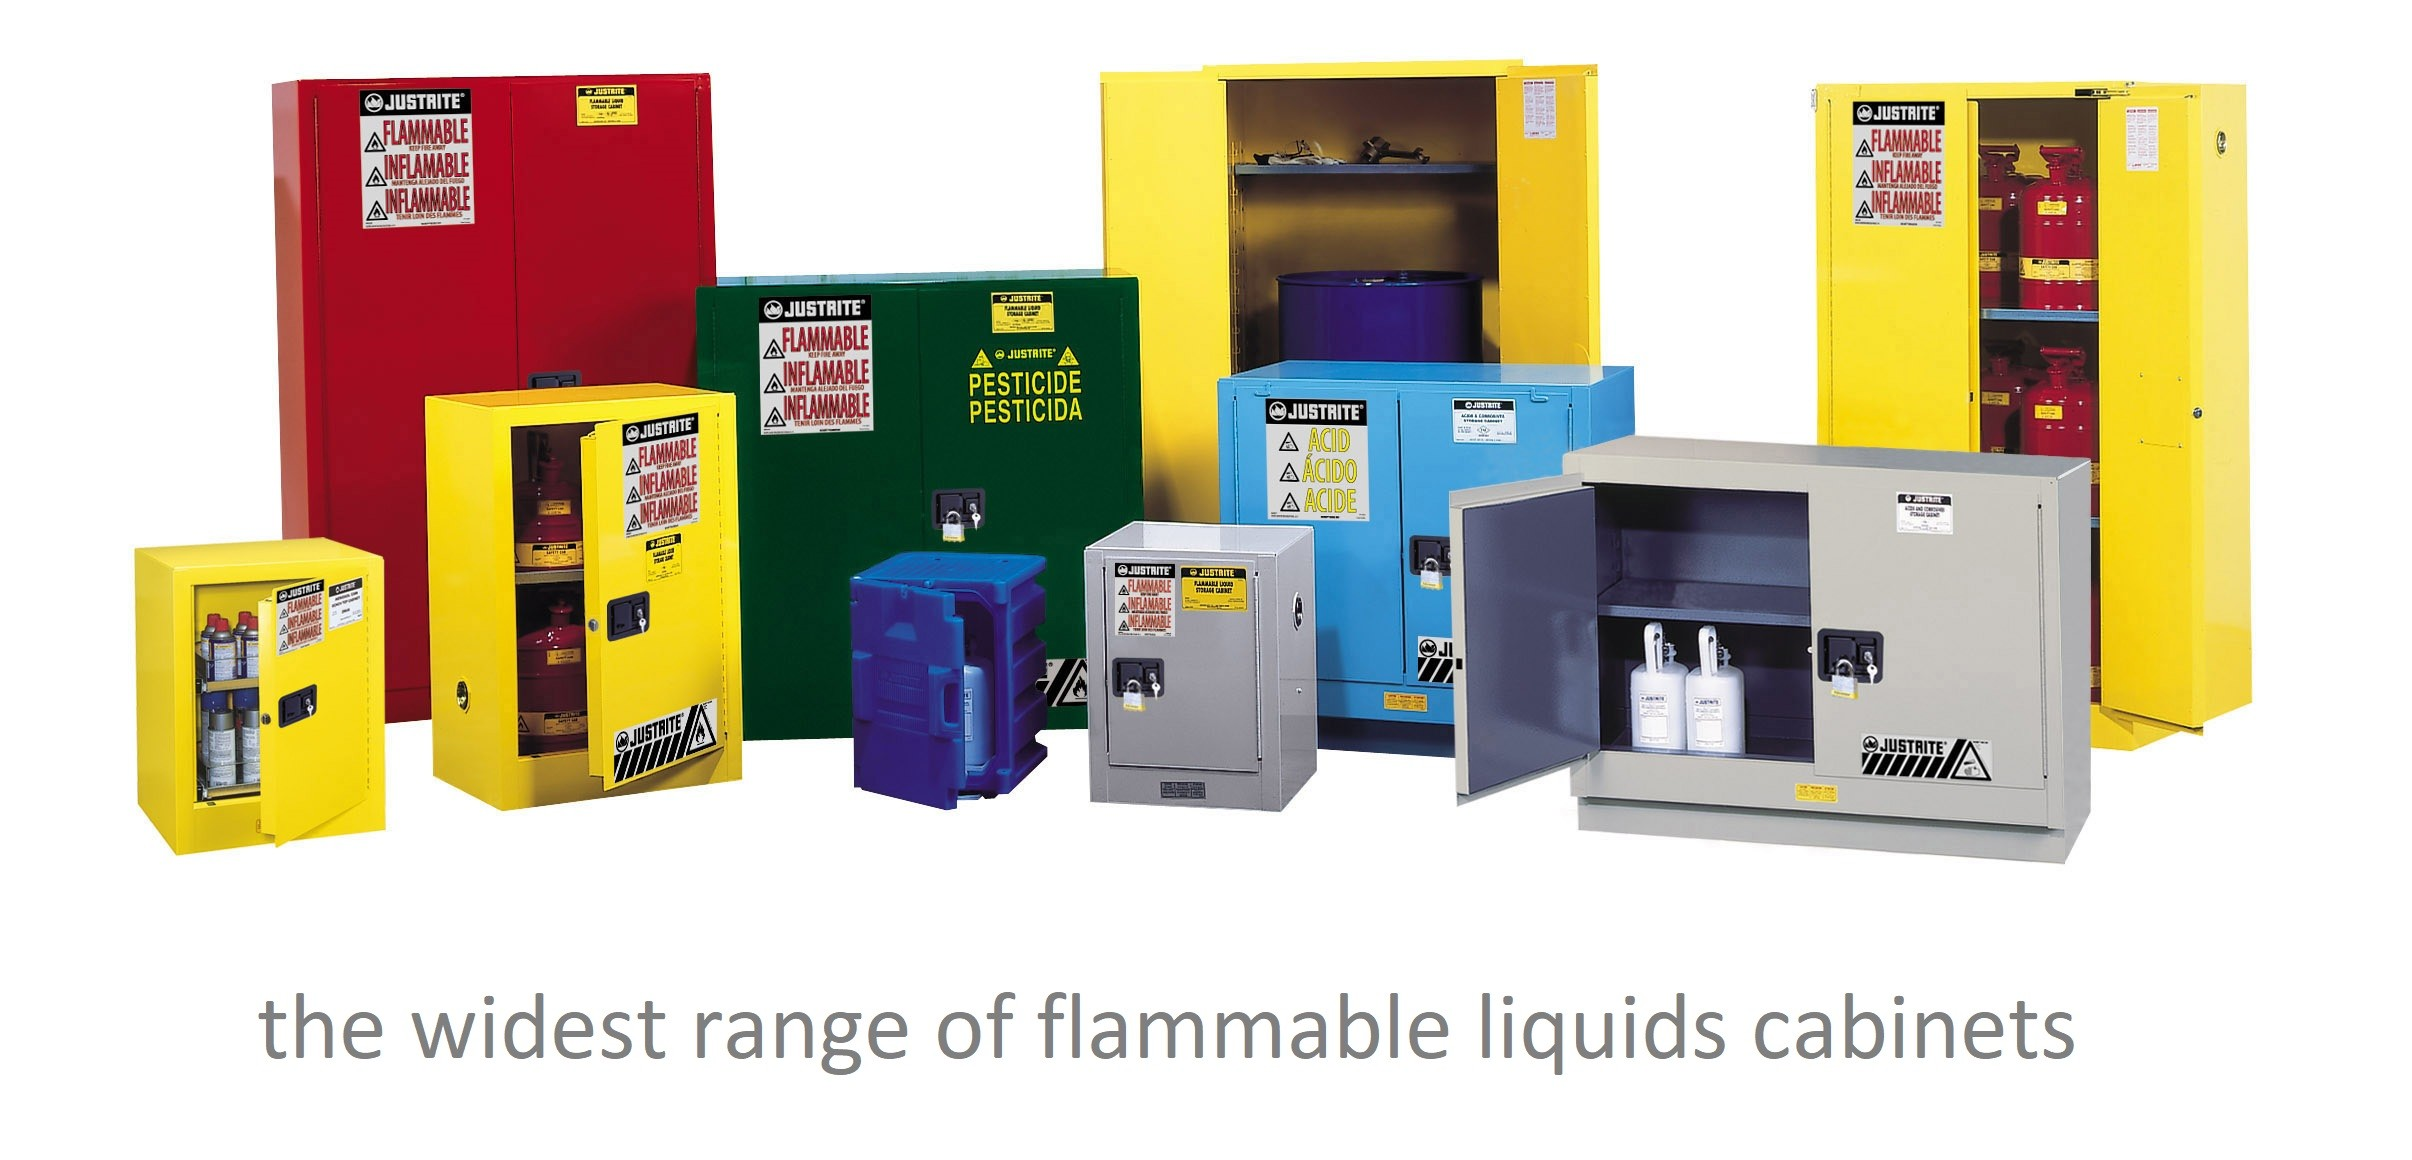 flammable liquids cabinets